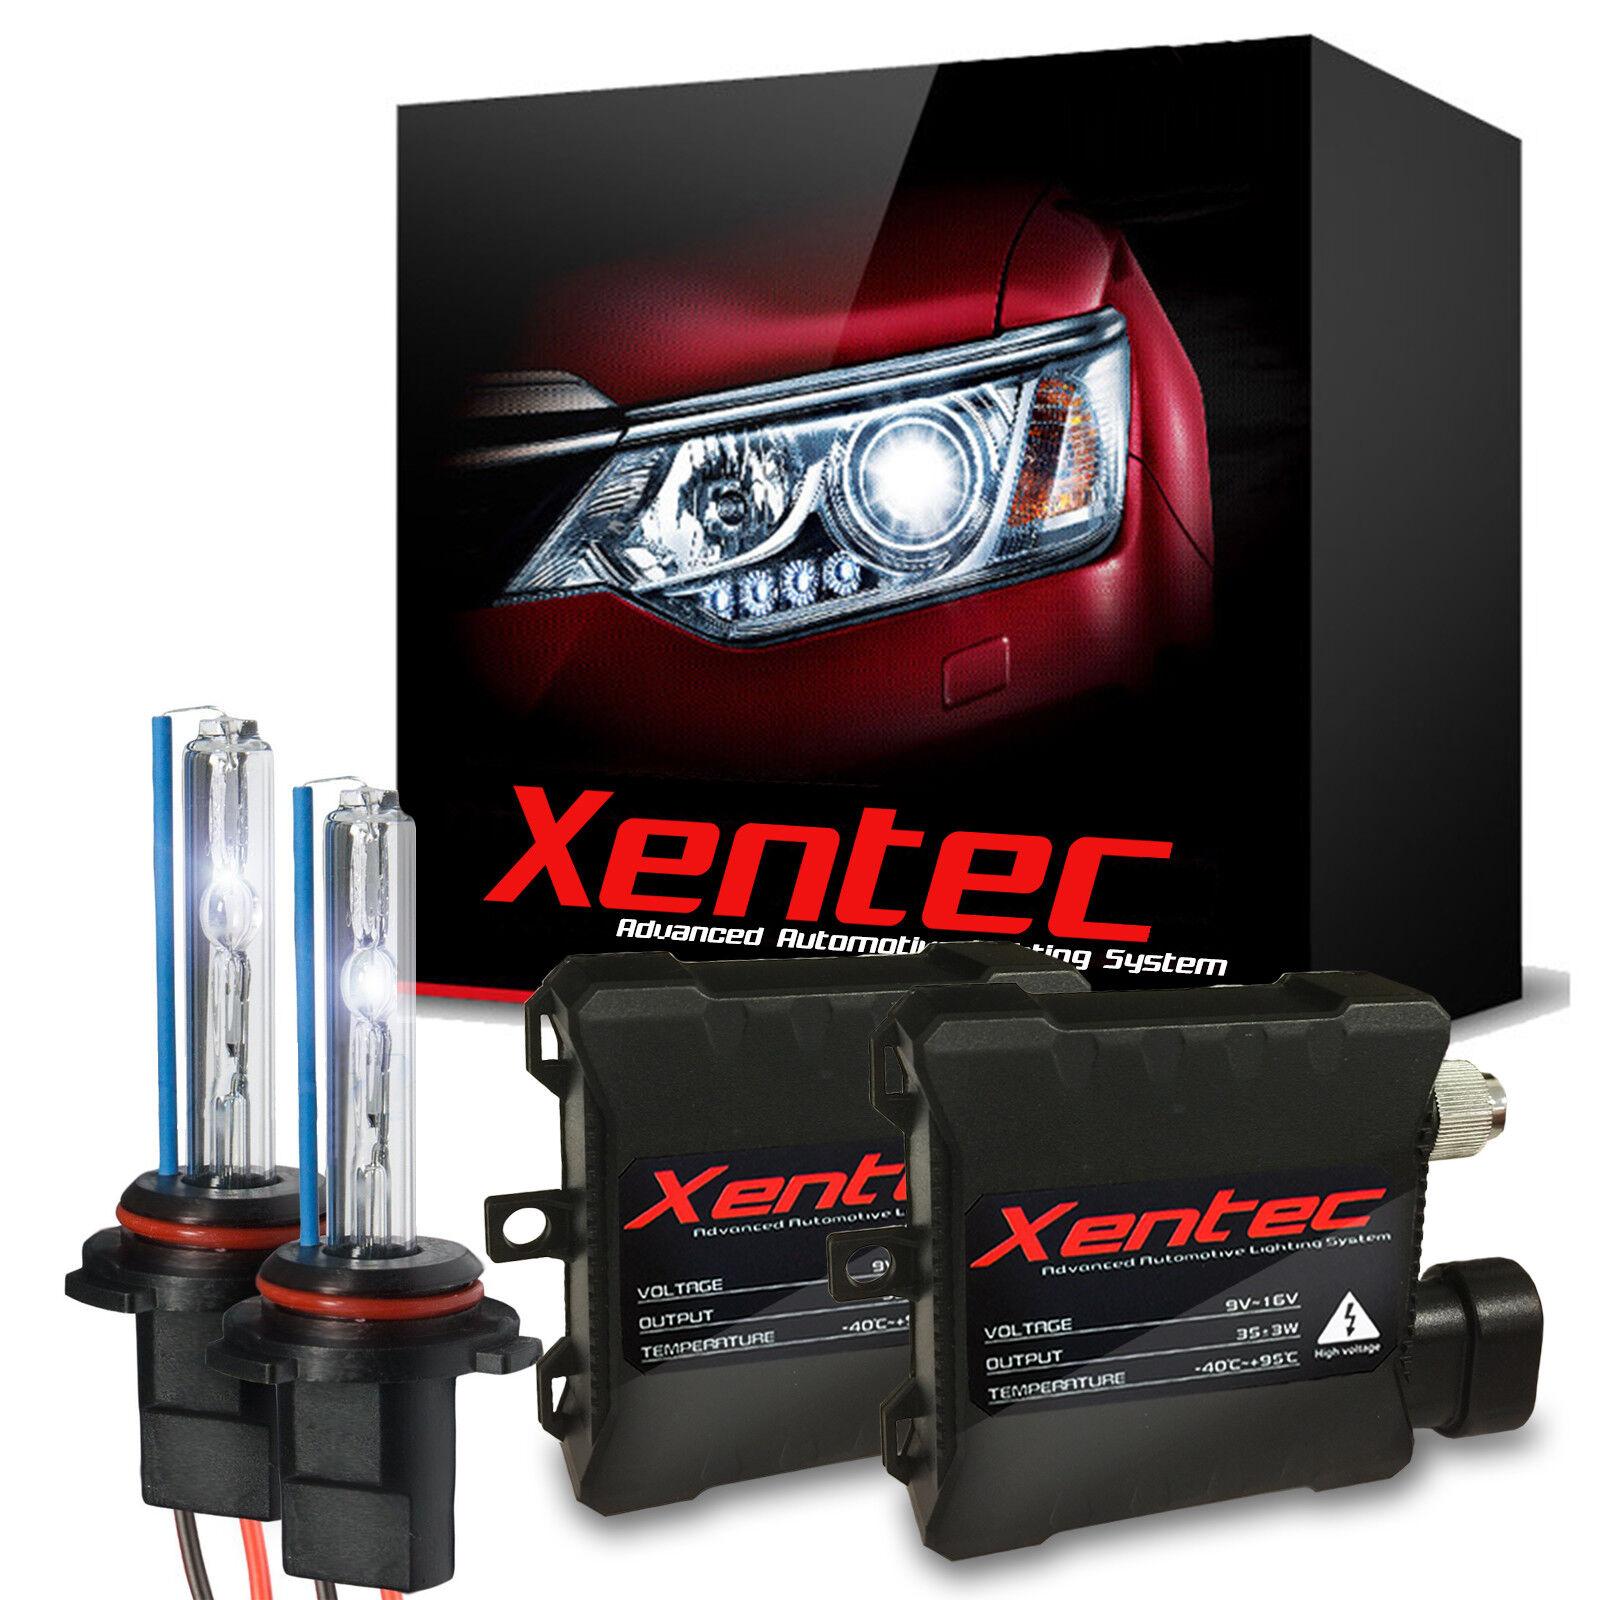 Xentec 35W Xenon HID Kit for Suzuki Aerio Equator Esteem Forenza Grand Vitara